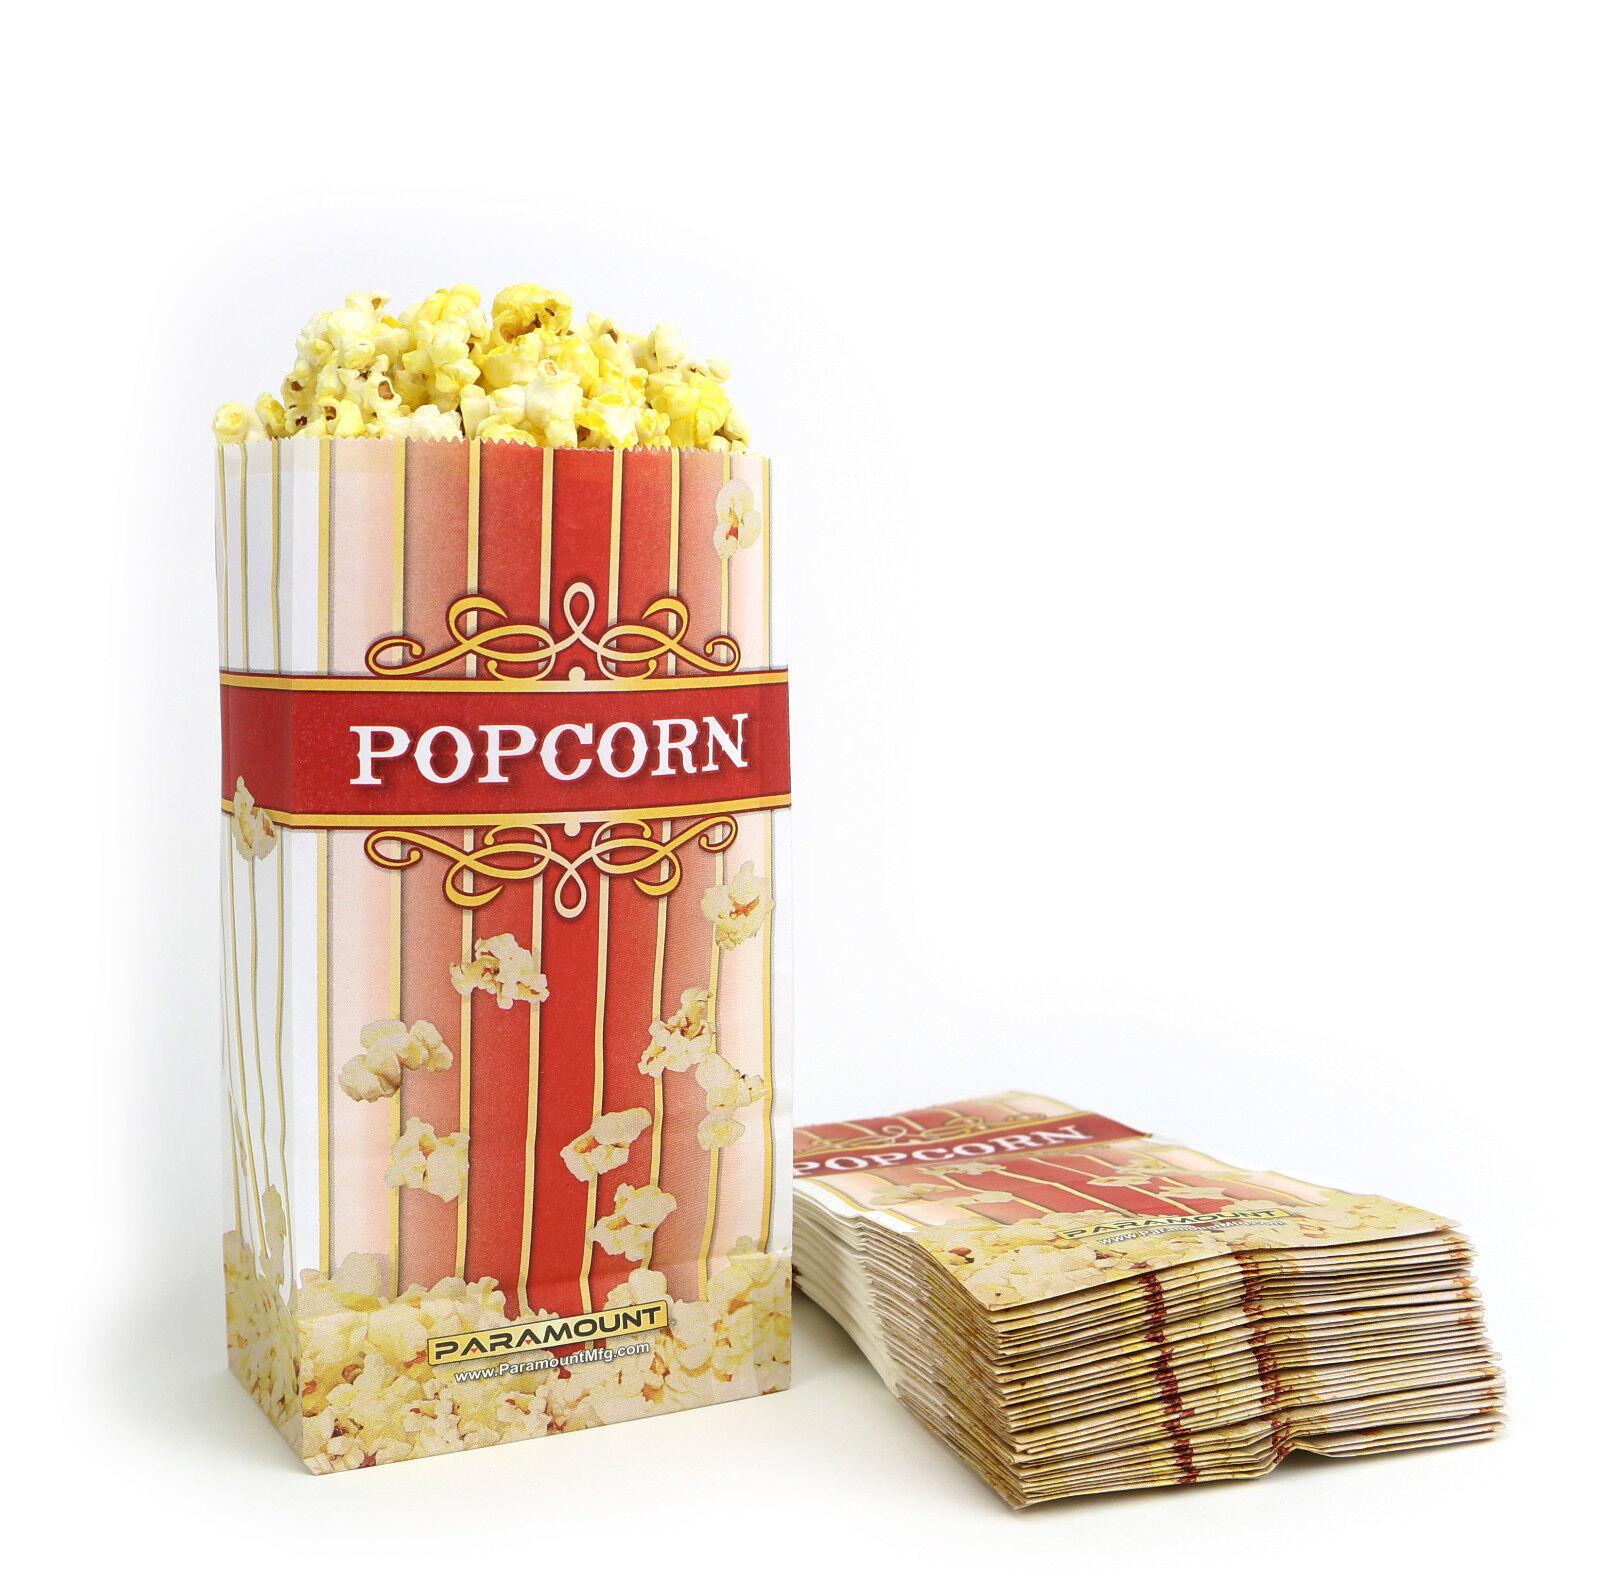 100 Popcorn Serving Bags, 'Small' Standalone Flat Bottom Pap